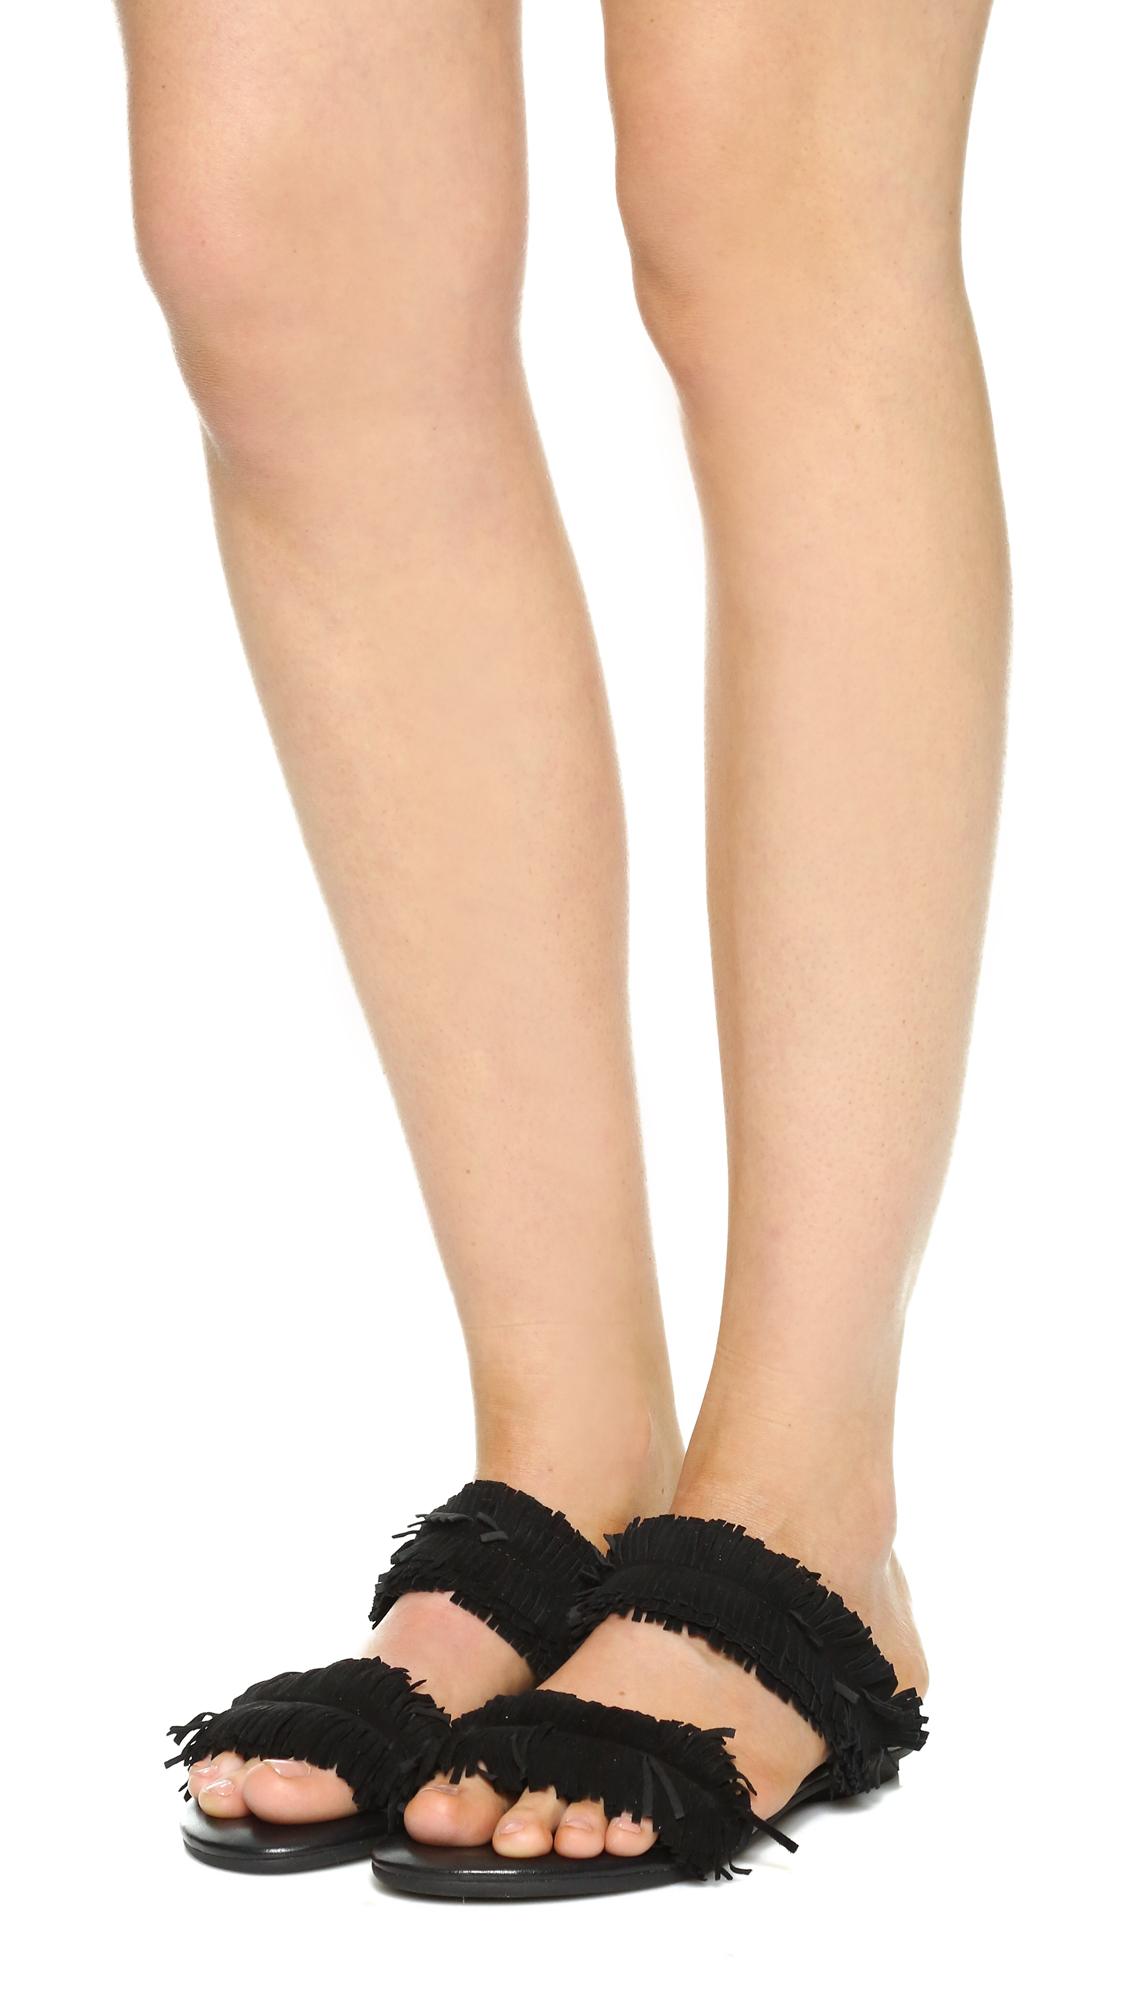 ee2199887d8b Joie Pippa Slide Sandals